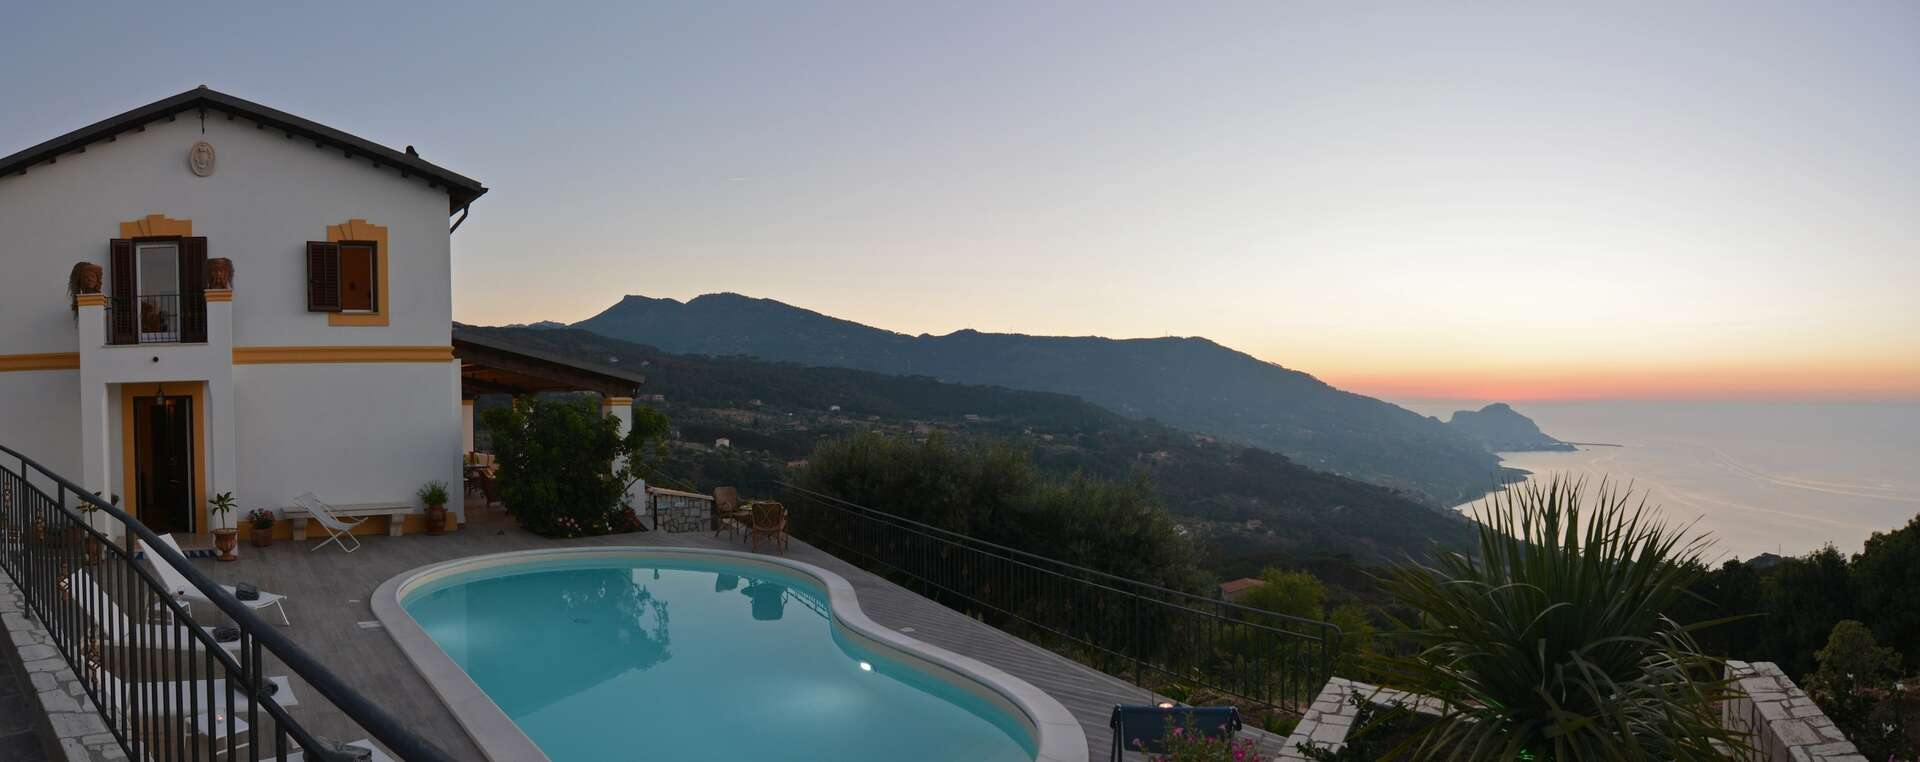 - Villa il Basto - Image 1/29